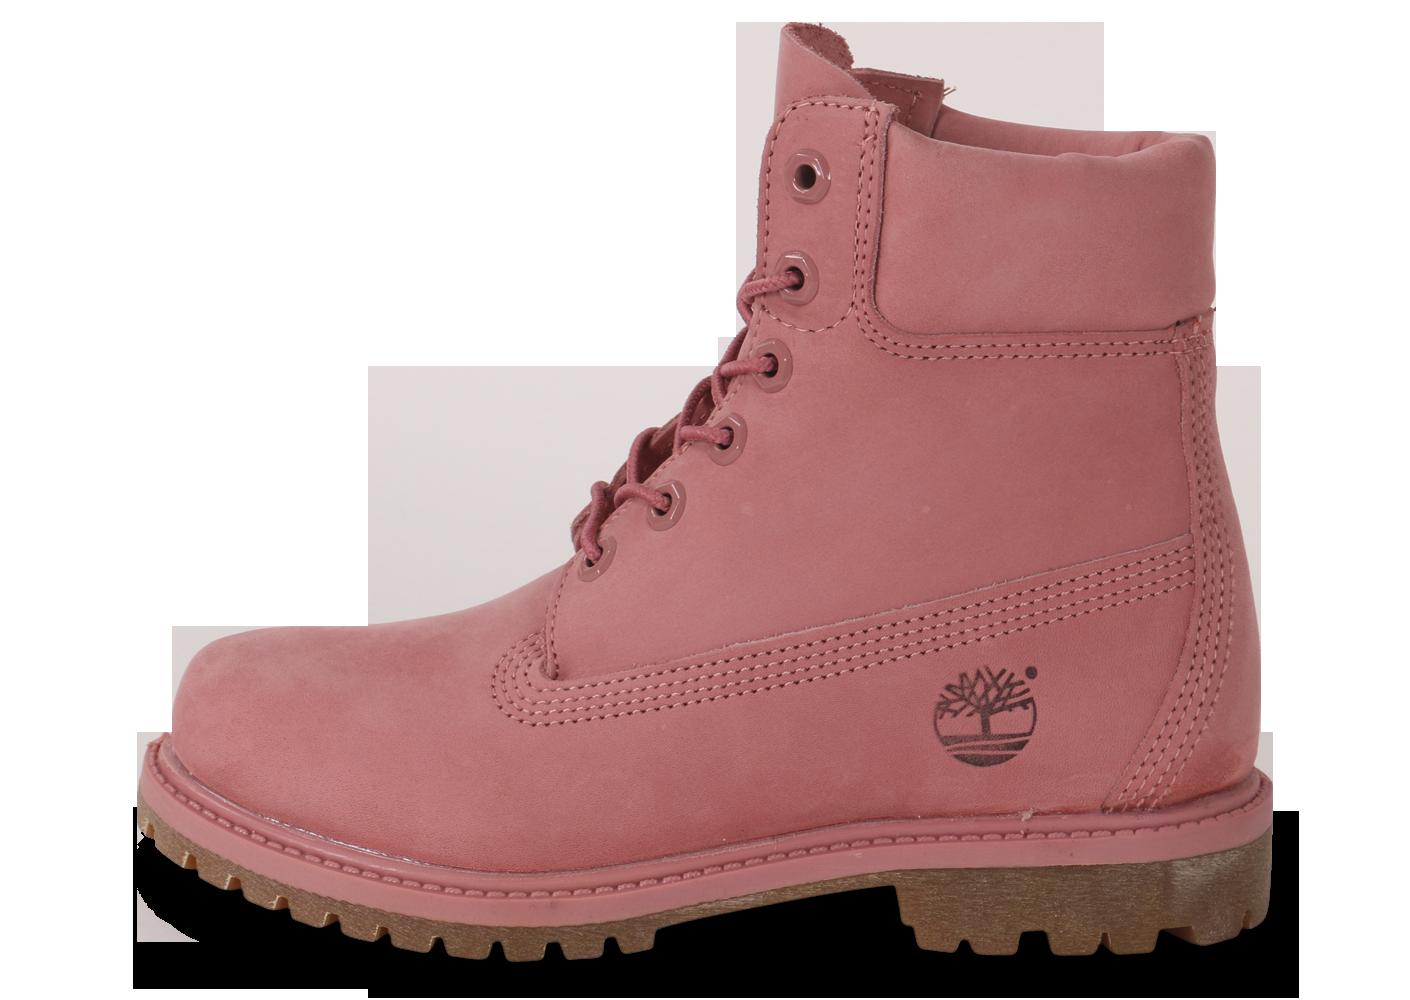 Timberland 6 Inch Premium Boot rose